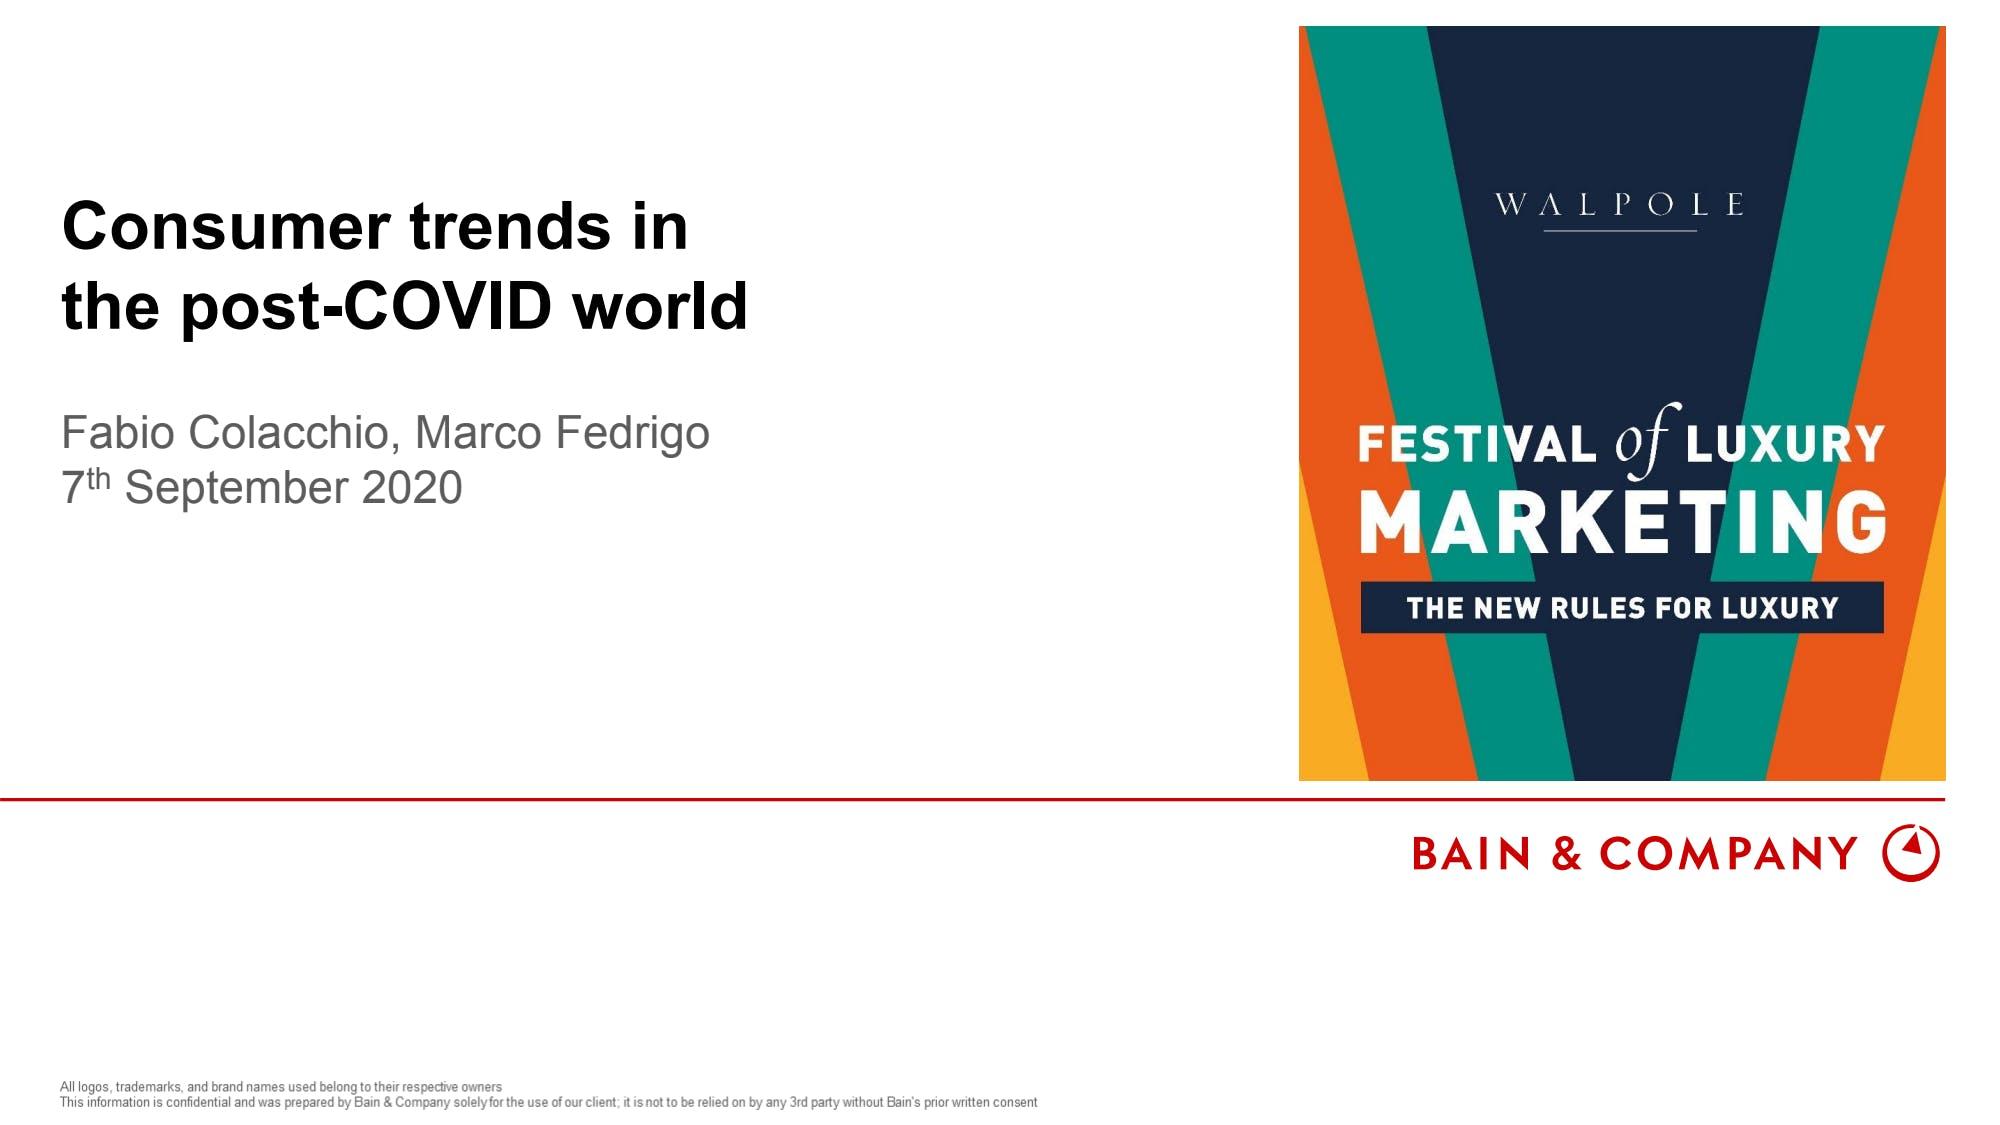 Festival of Luxury Marketing  Day 1 - Highlights